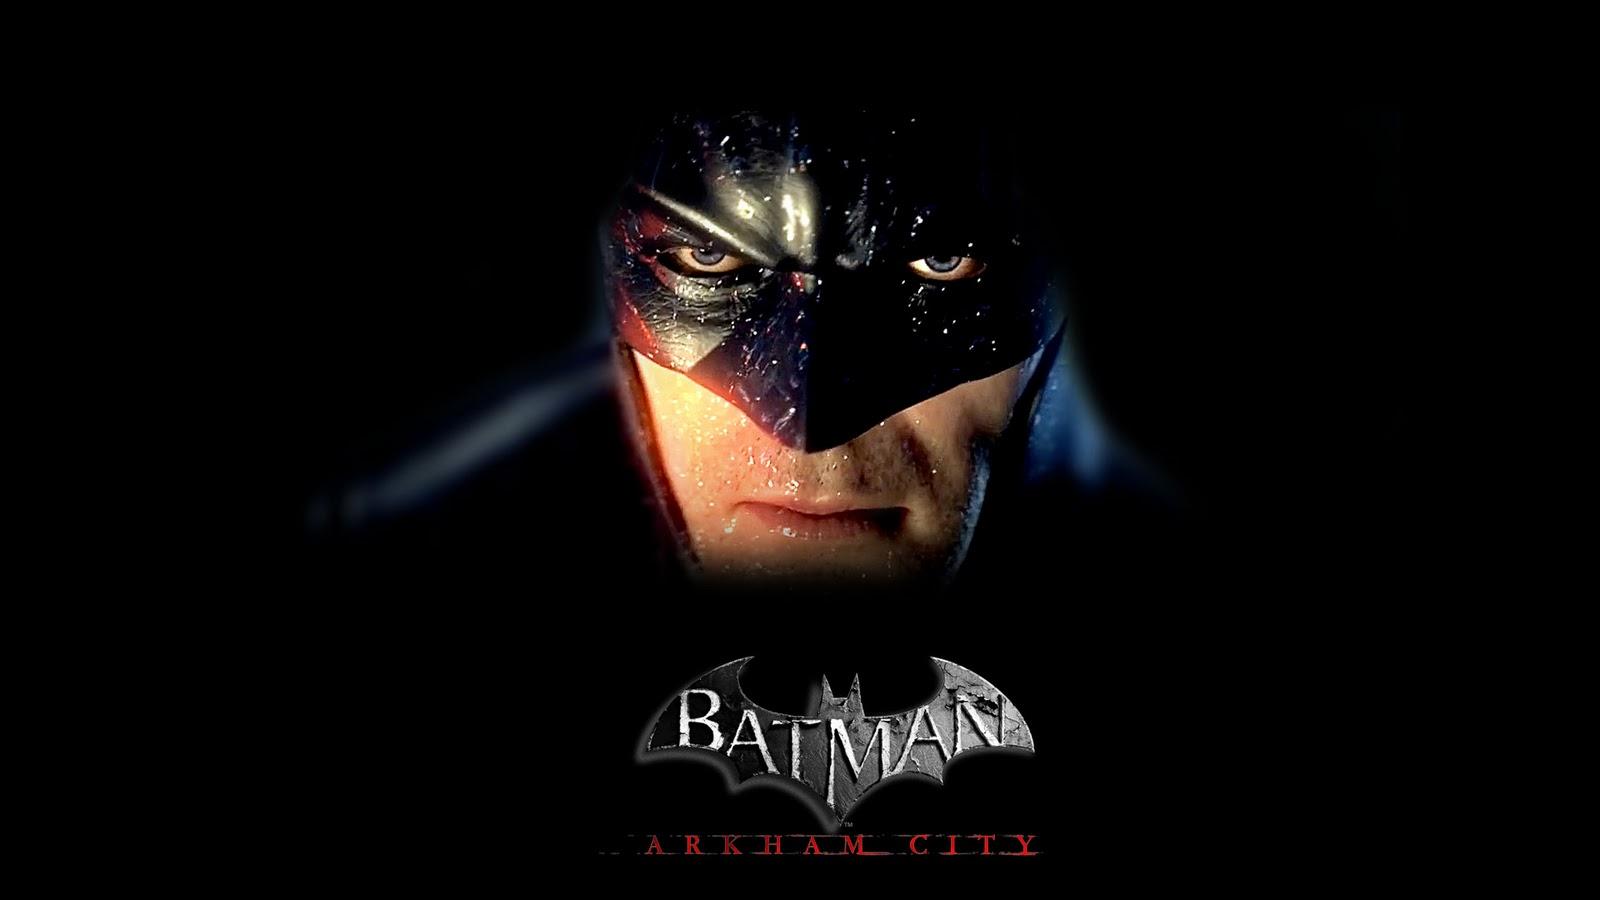 Free Download Heroologycom 1080p Batman Arkham City Wallpaper Hd 5